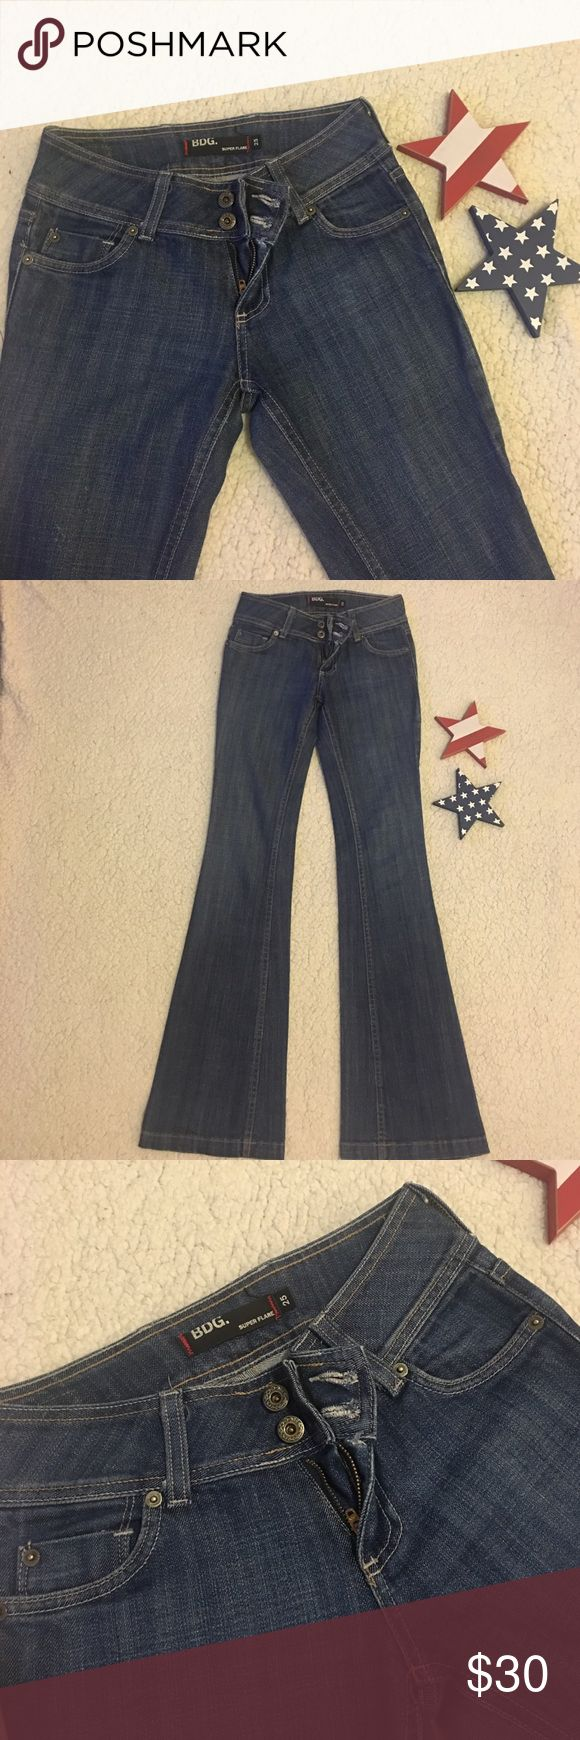 "BDG Super Flare Jeans - LIKE NEW BDG Super Flare Jeans - LIKE NEW - Really nice denim jean - Stretch - Super Flare - Inseam 33"" BDG Jeans Flare & Wide Leg"